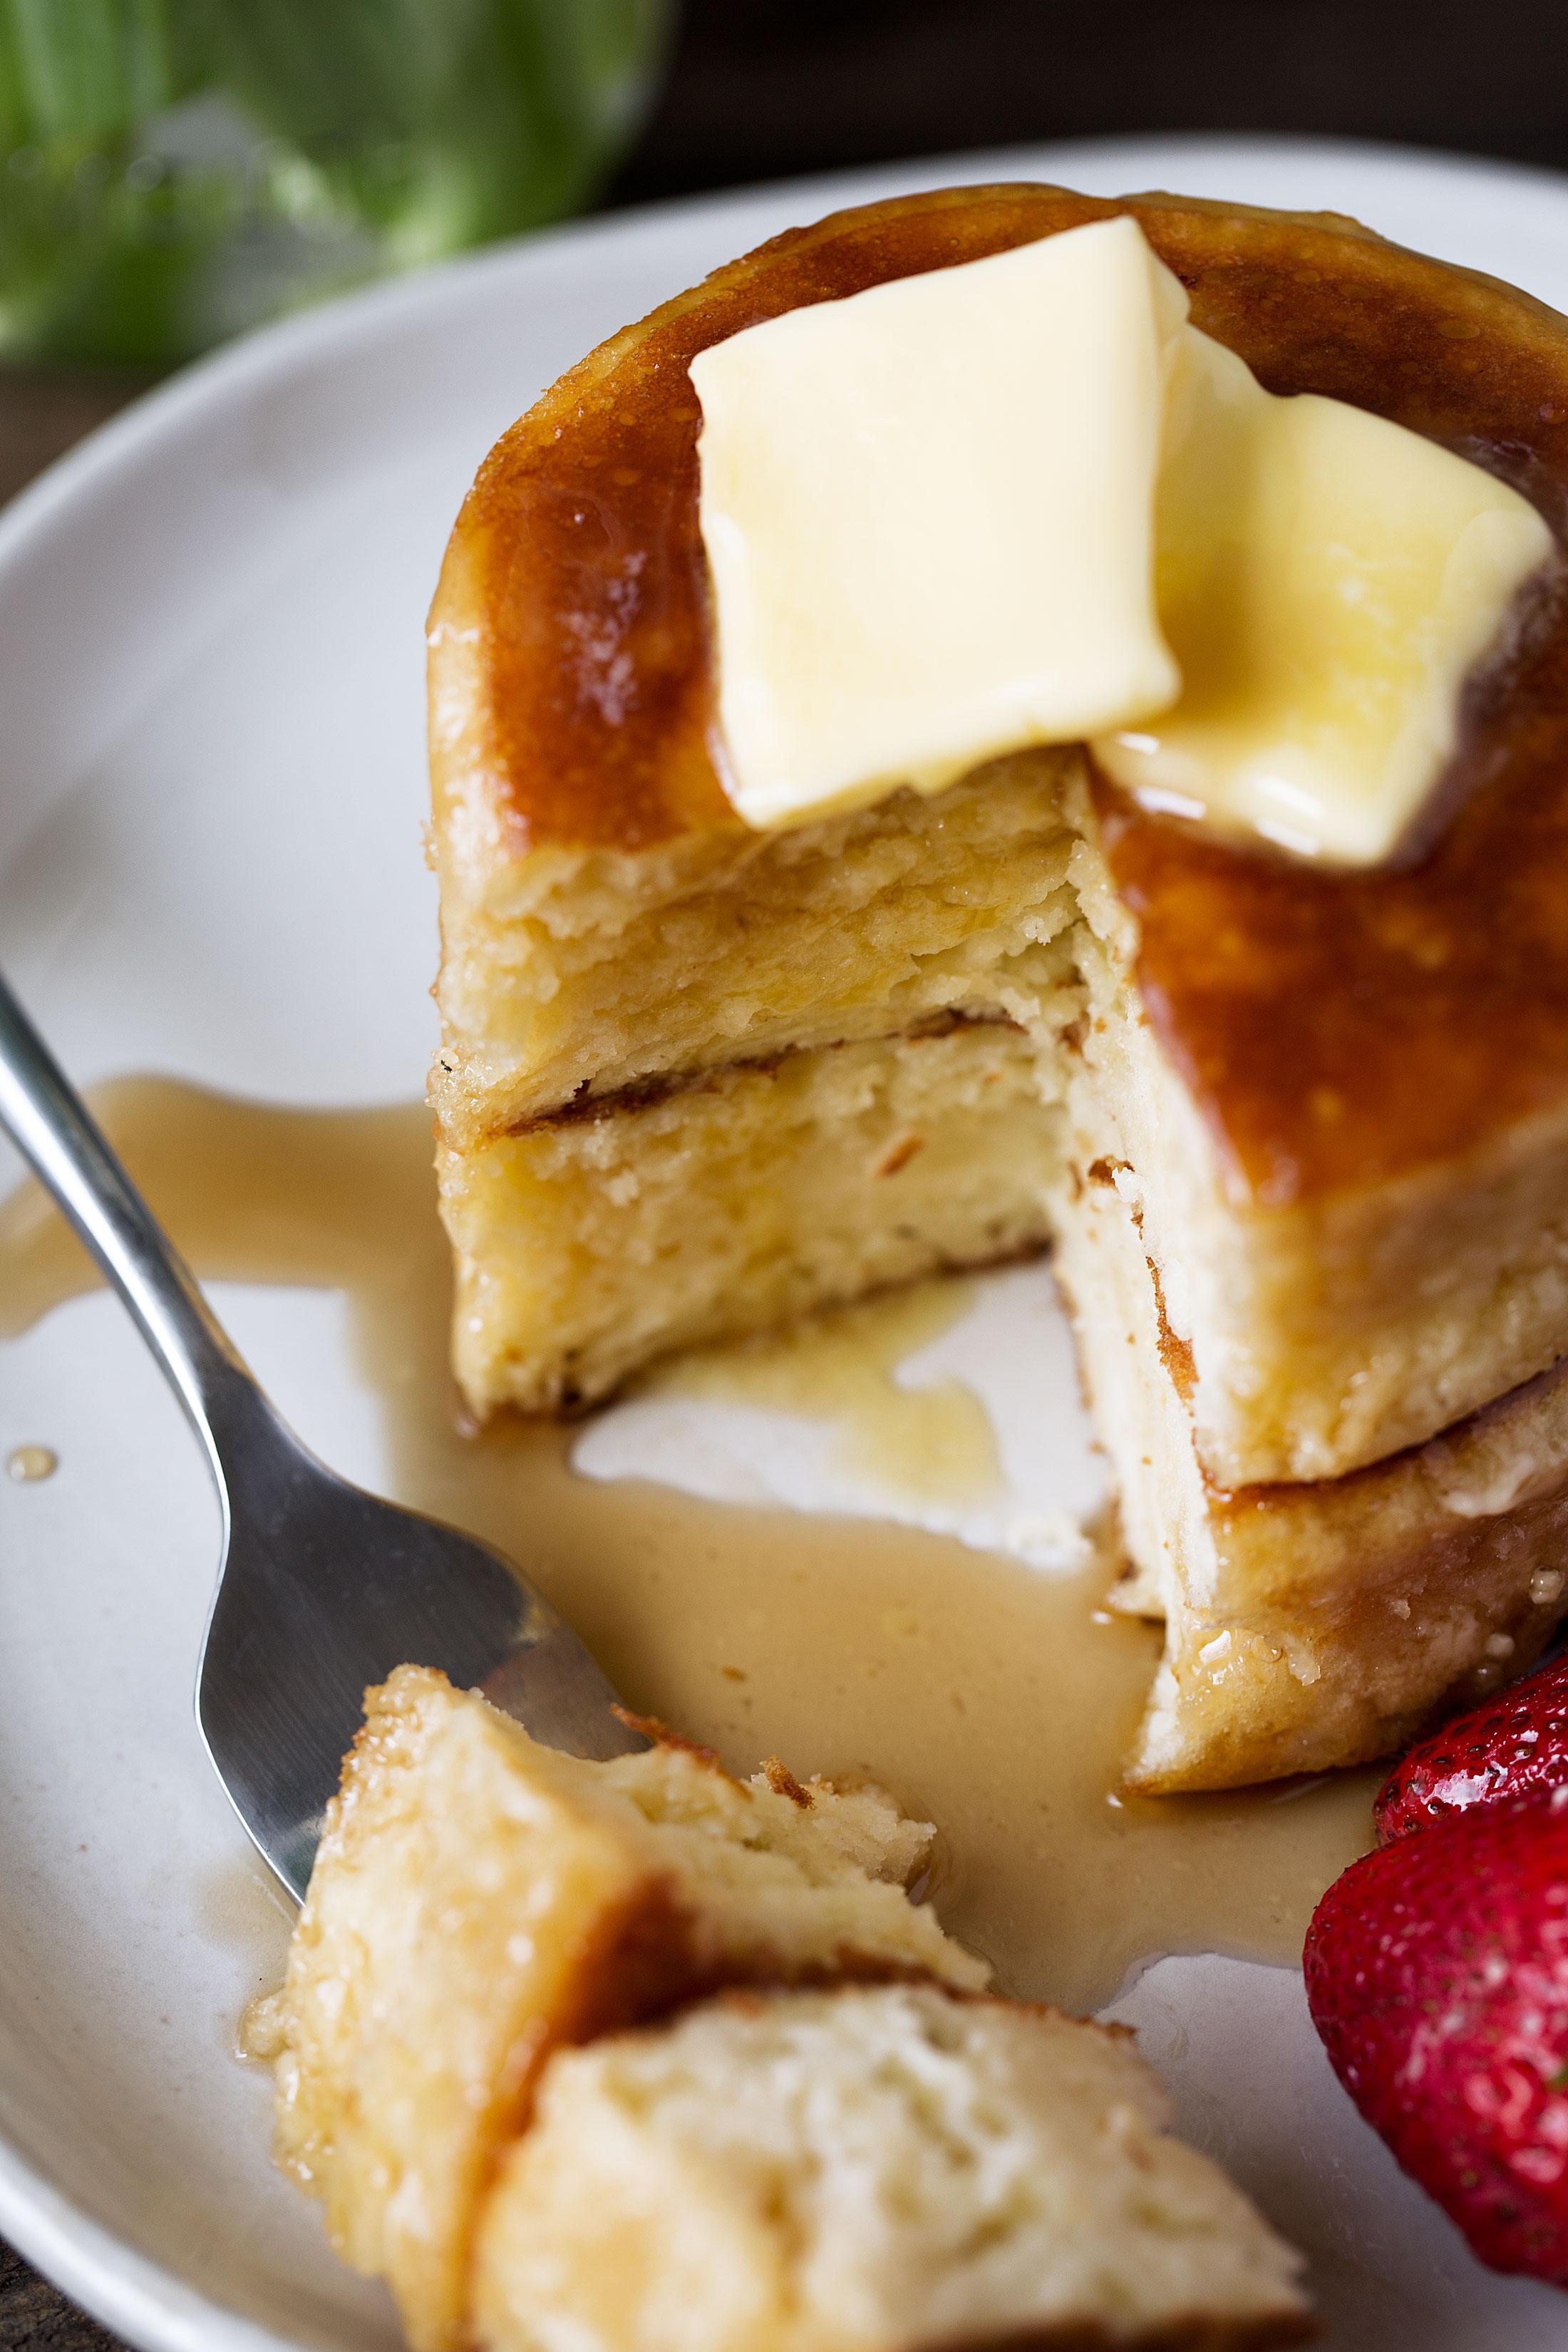 Japanese-style Soufflé Pancakes cut